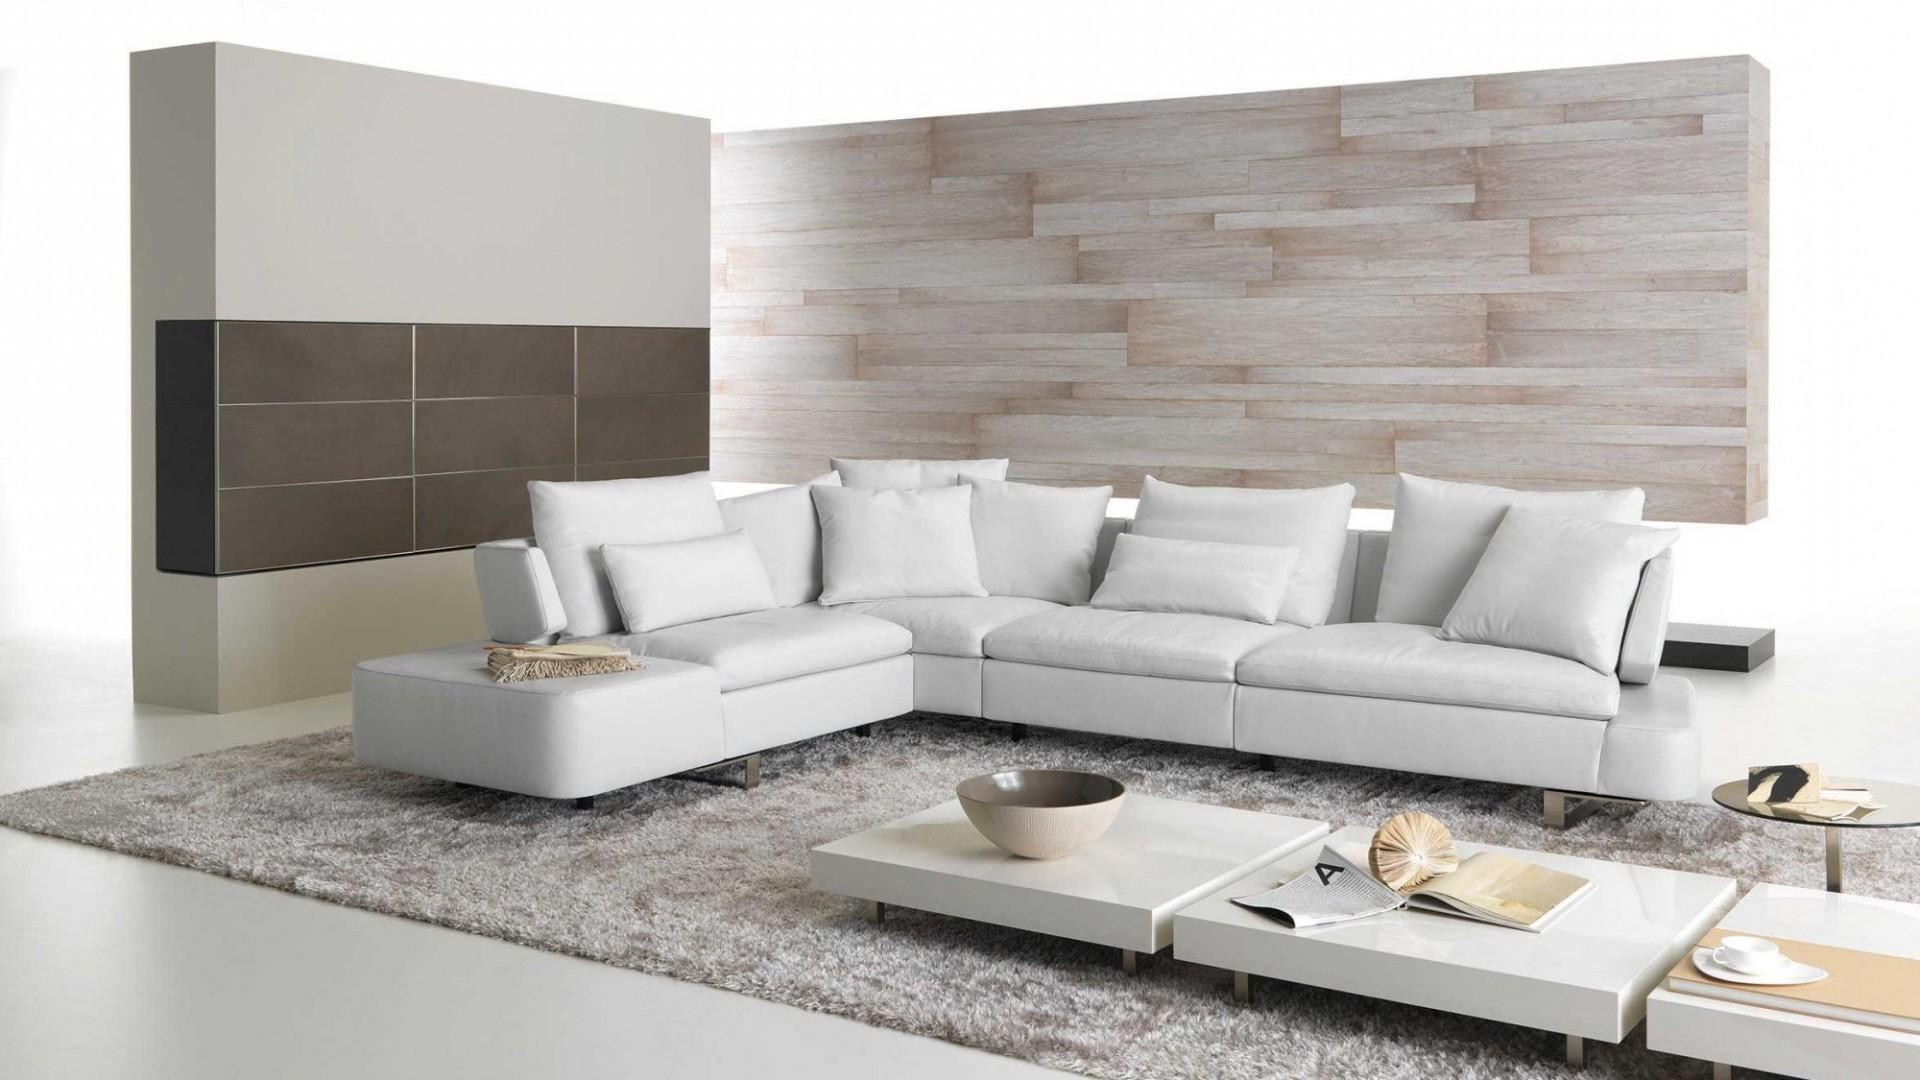 Trendy Elegant Natuzzi Sectional Sofa (32 Photos) (View 12 of 15)